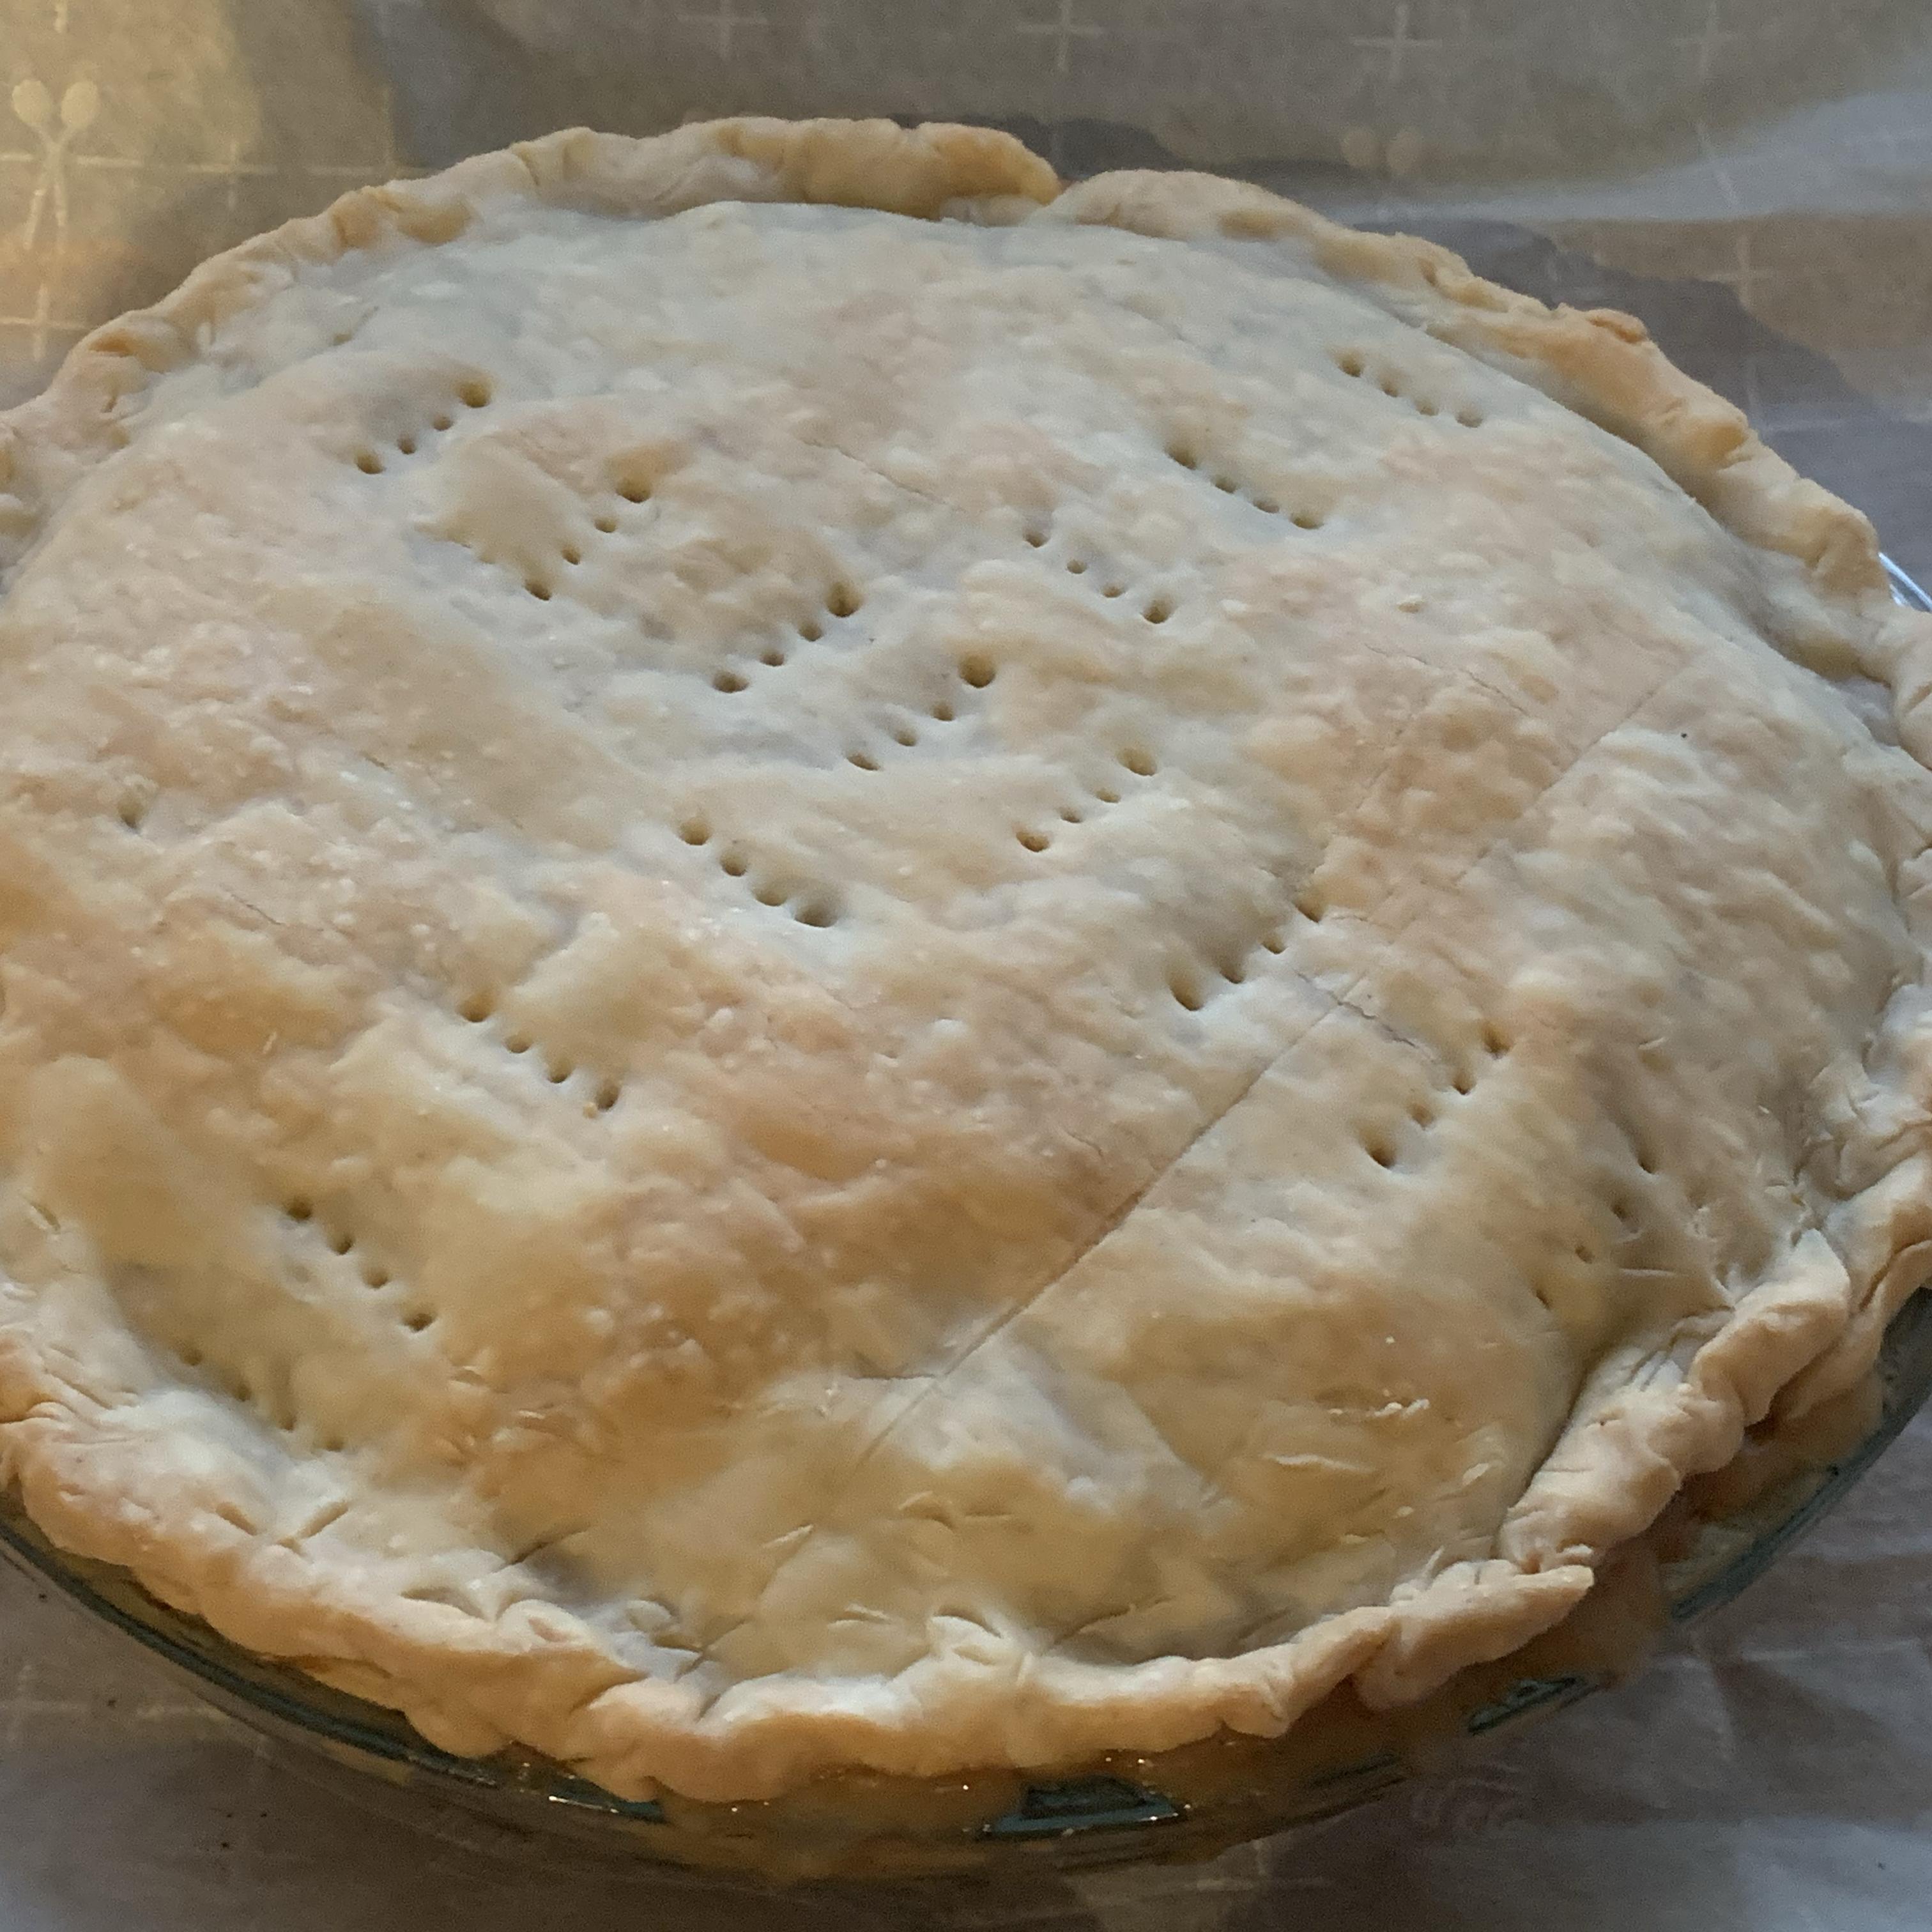 Tasty Meat Pie conniejeancameron